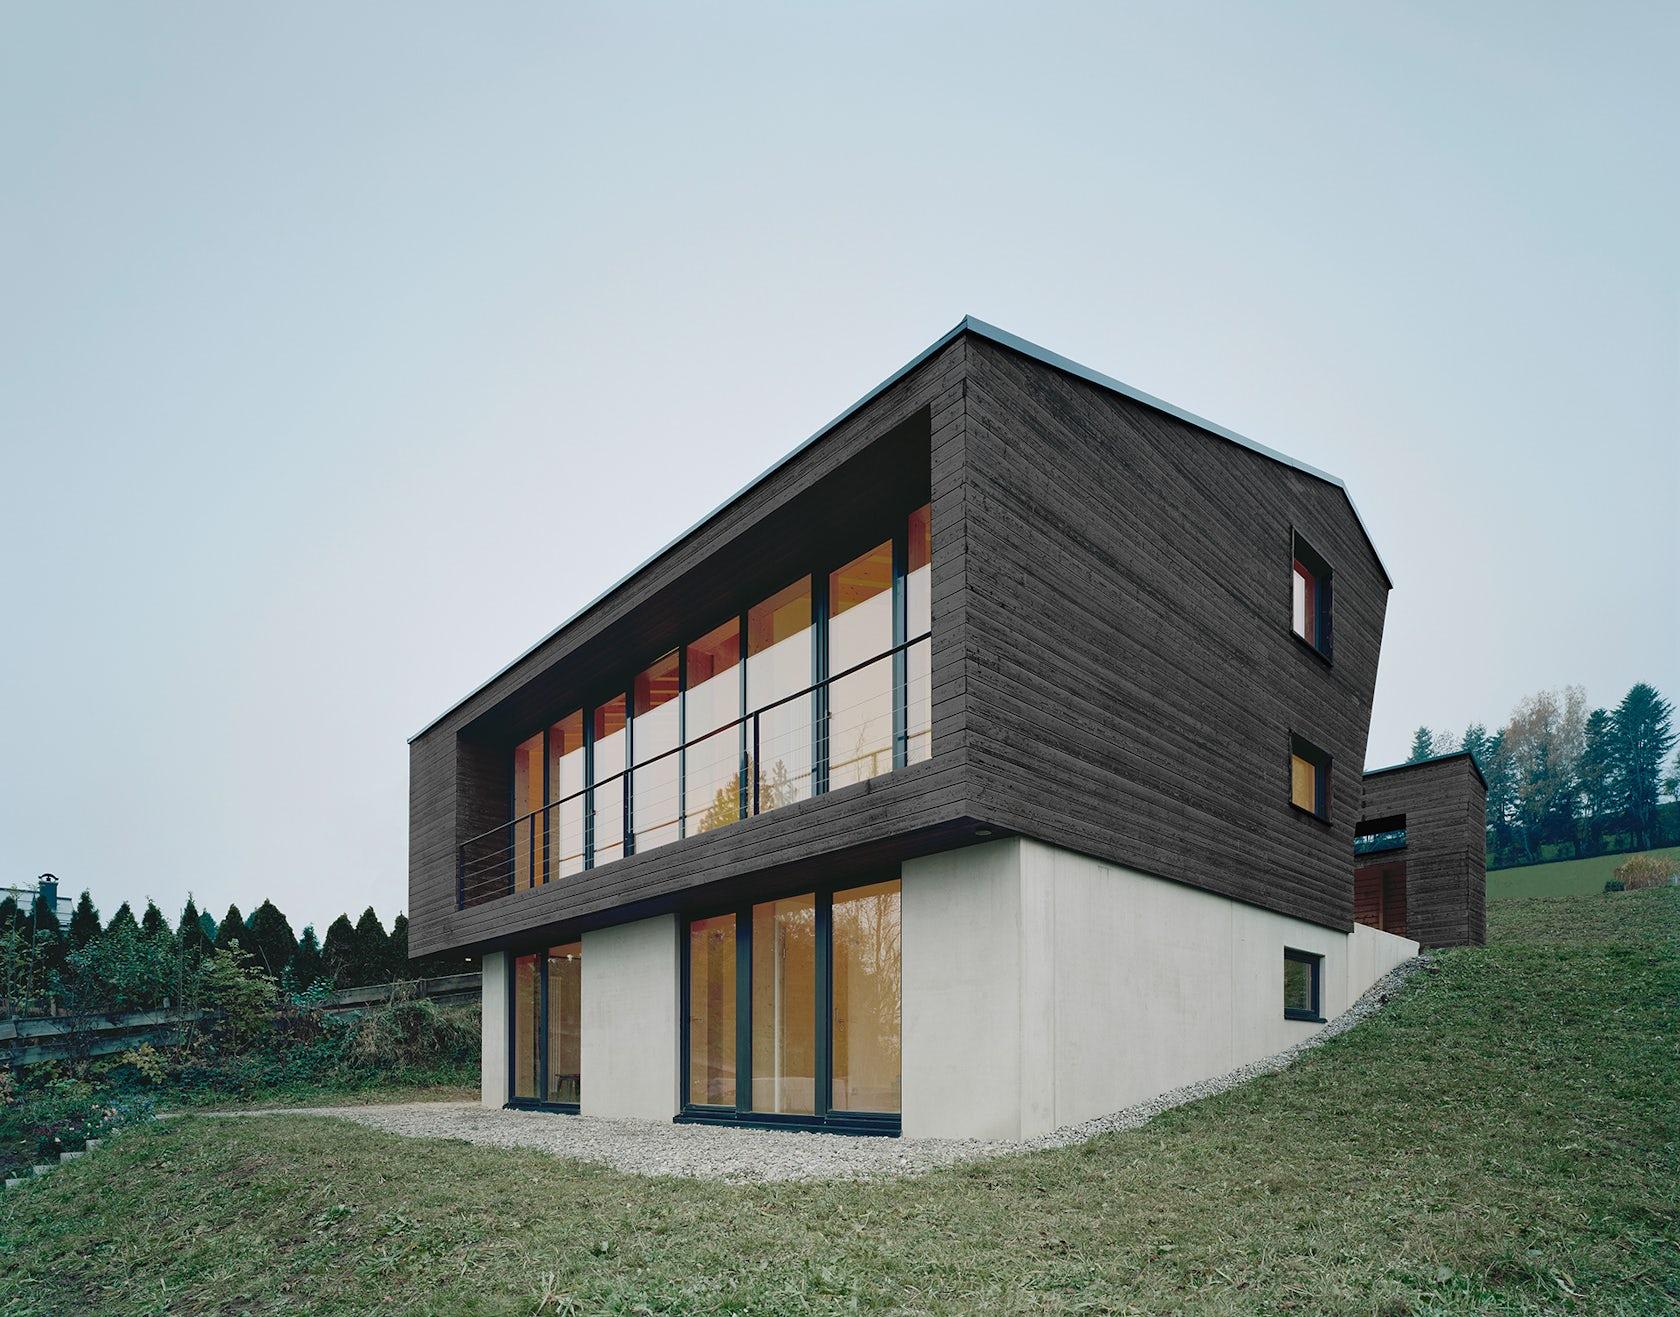 Haus p architizer for Haus architektur